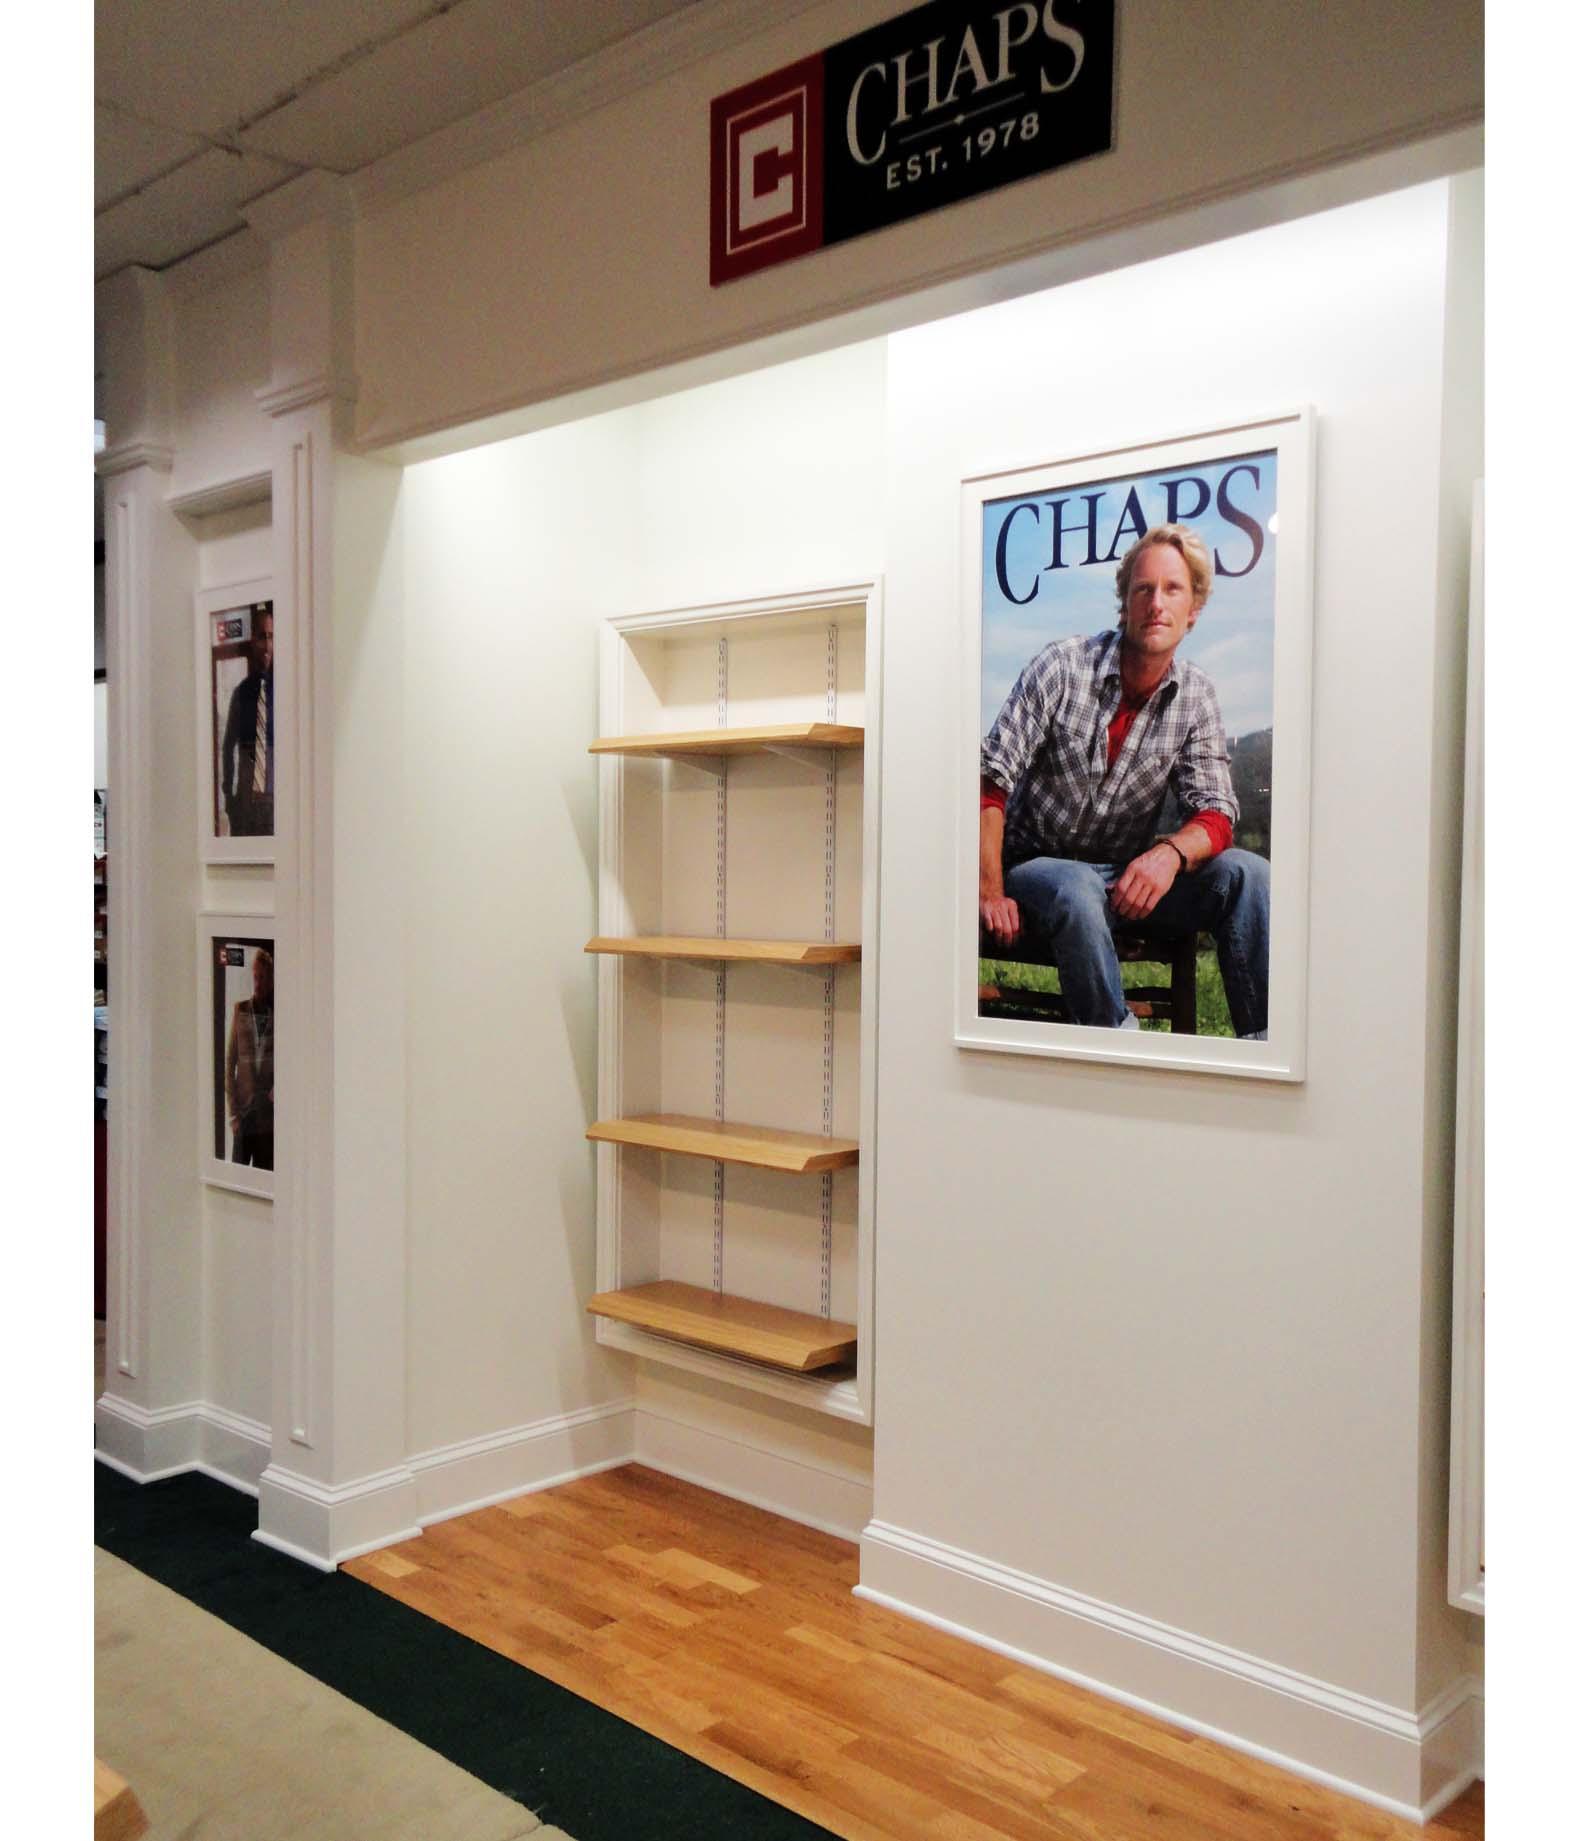 Retail - Shop-in-Shop for Chaps Shoes